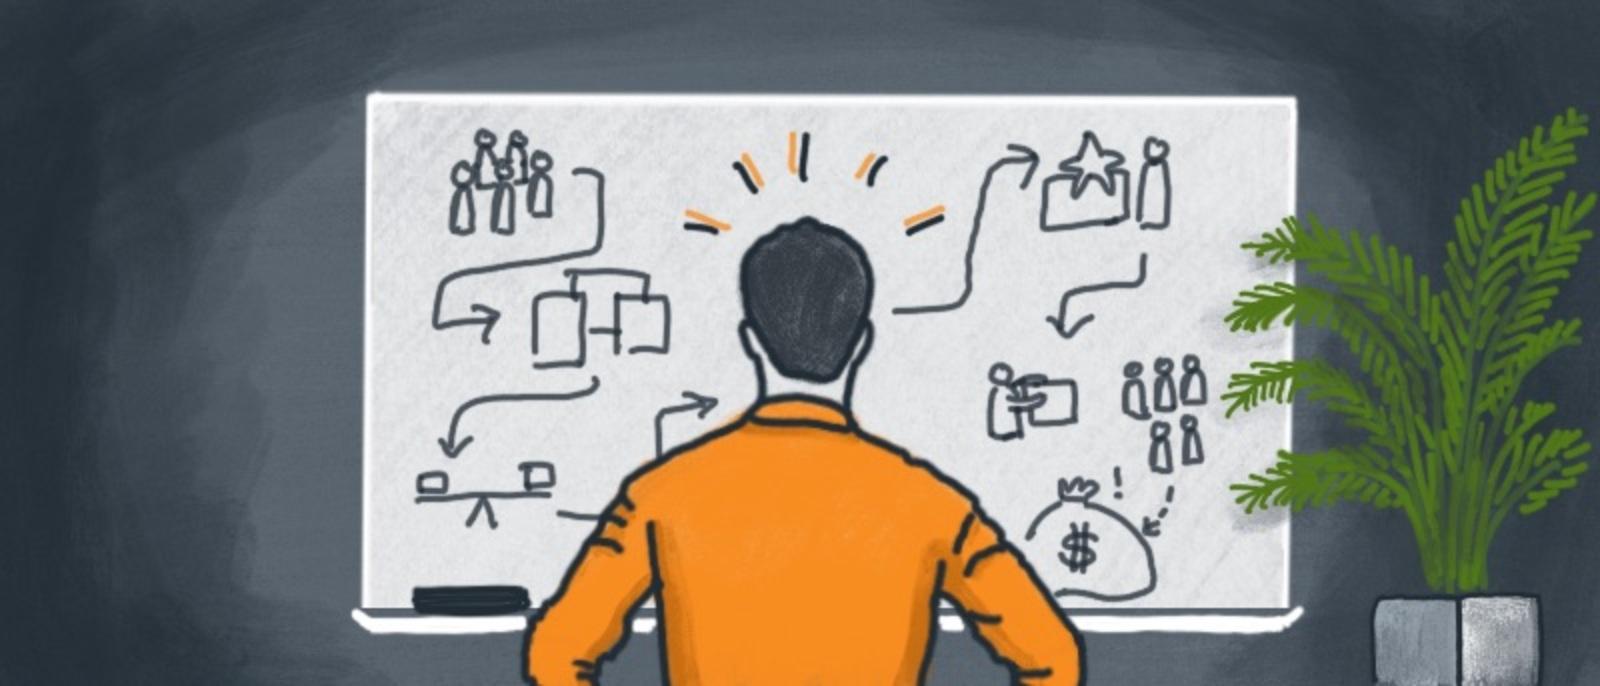 effective business processes